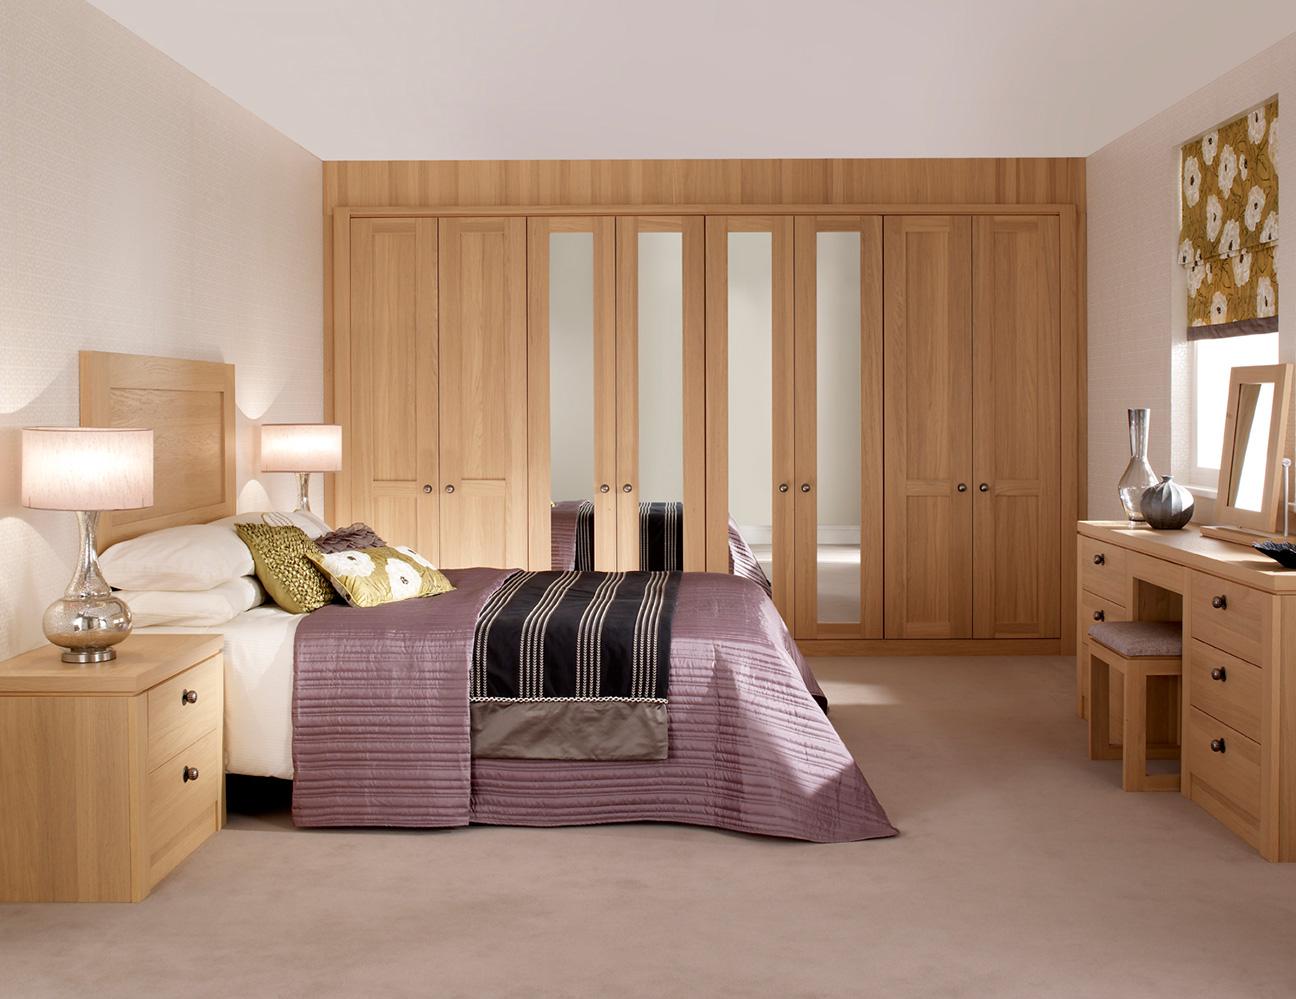 albany light oak bedroom wardrobes